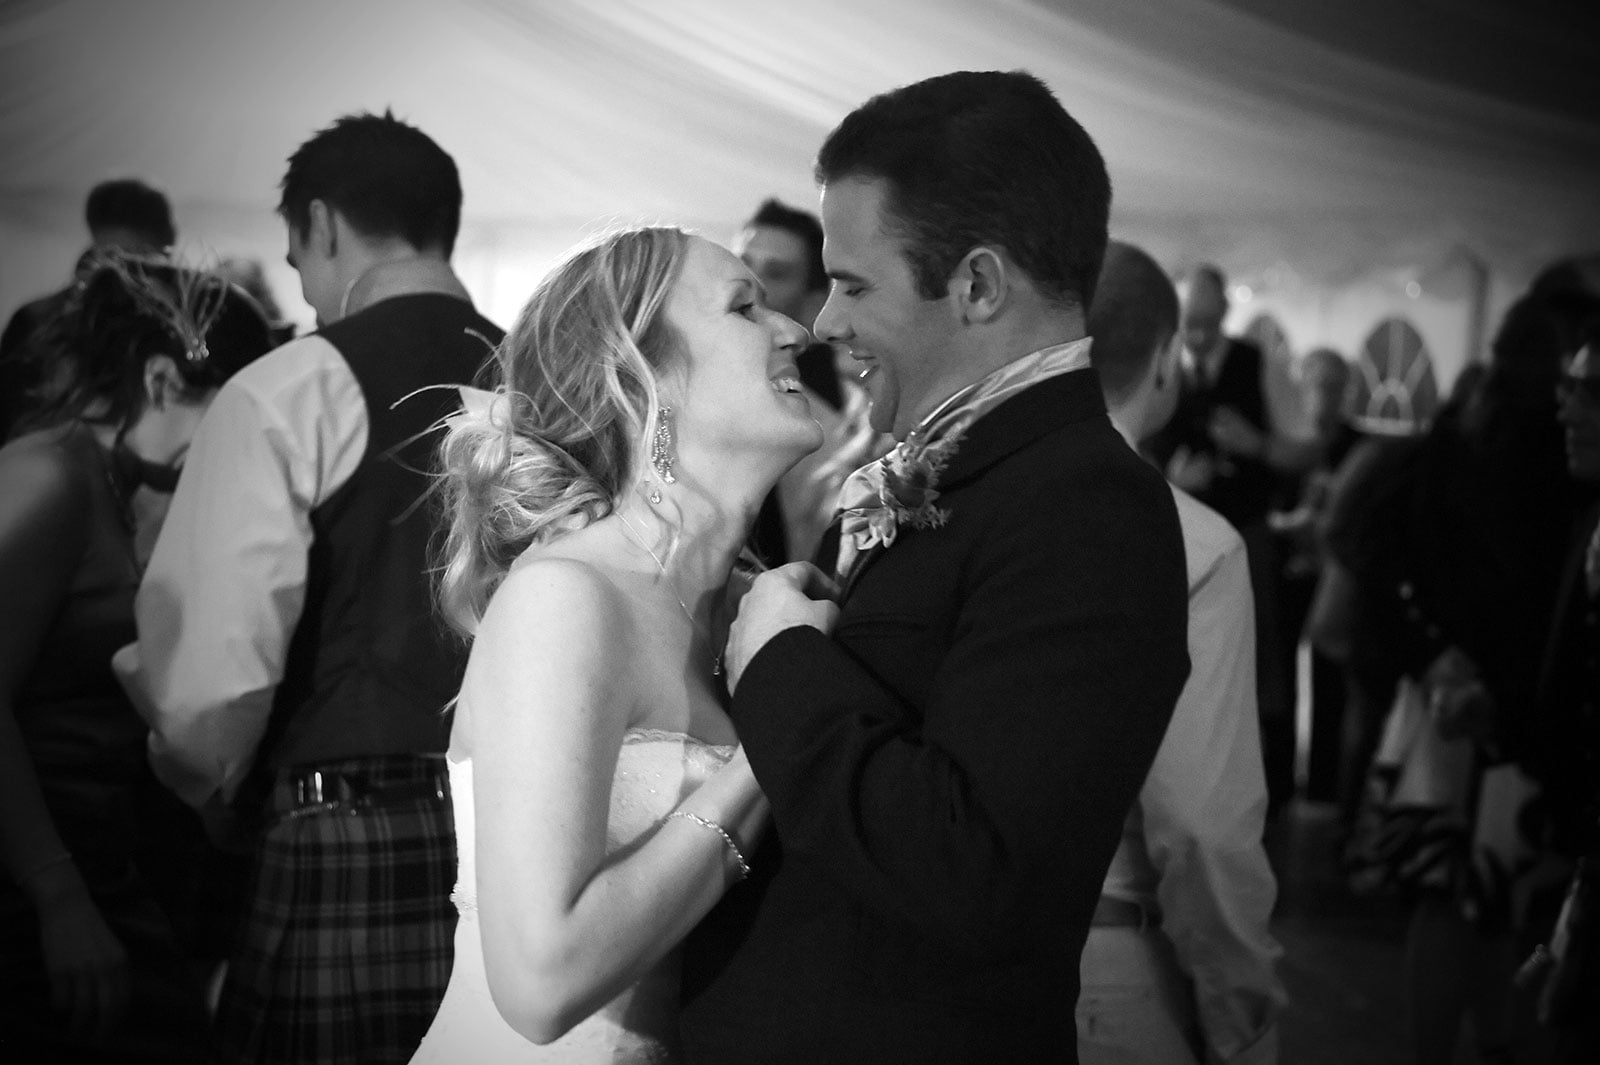 Cupar wedding - Angie and Irvine